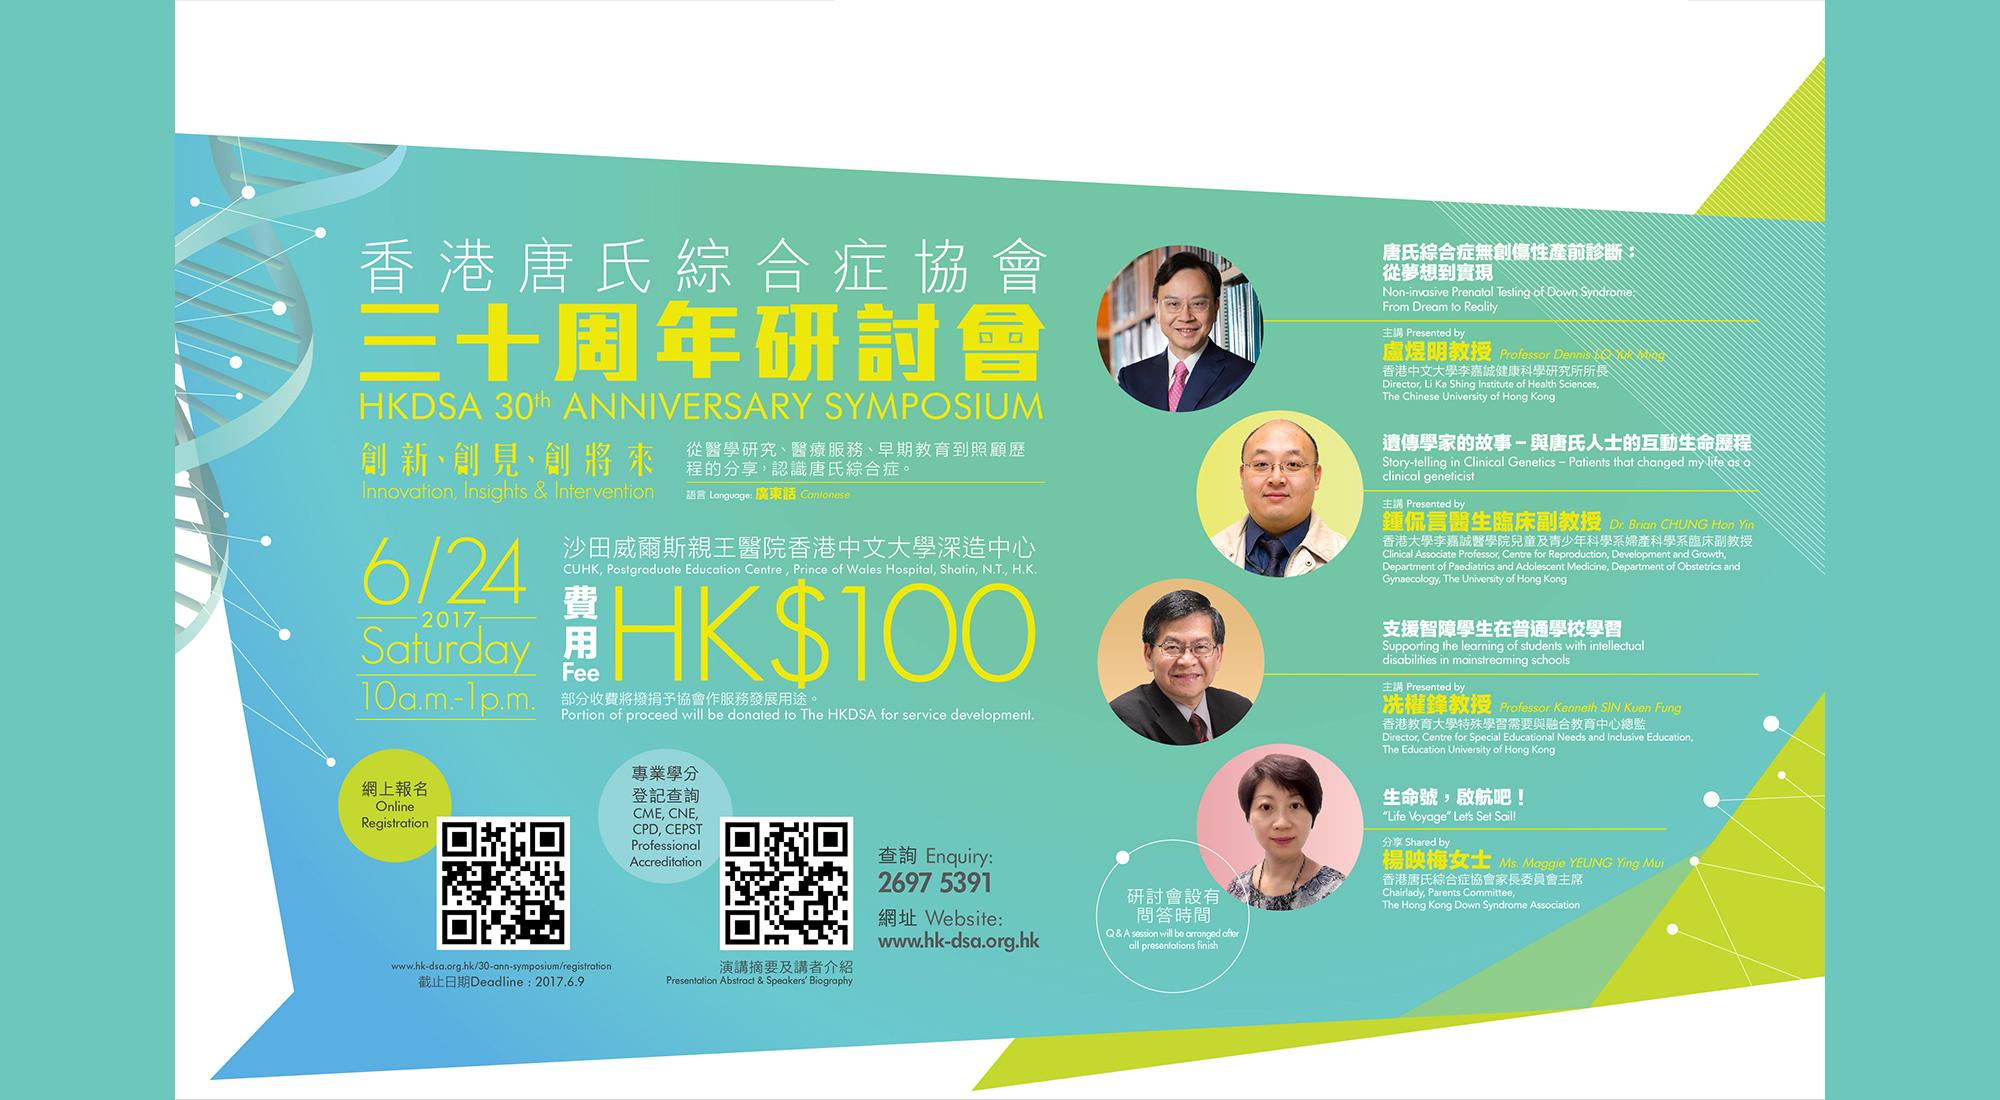 eBanner-HKDSA-30th-Anniversary-Symposium-1